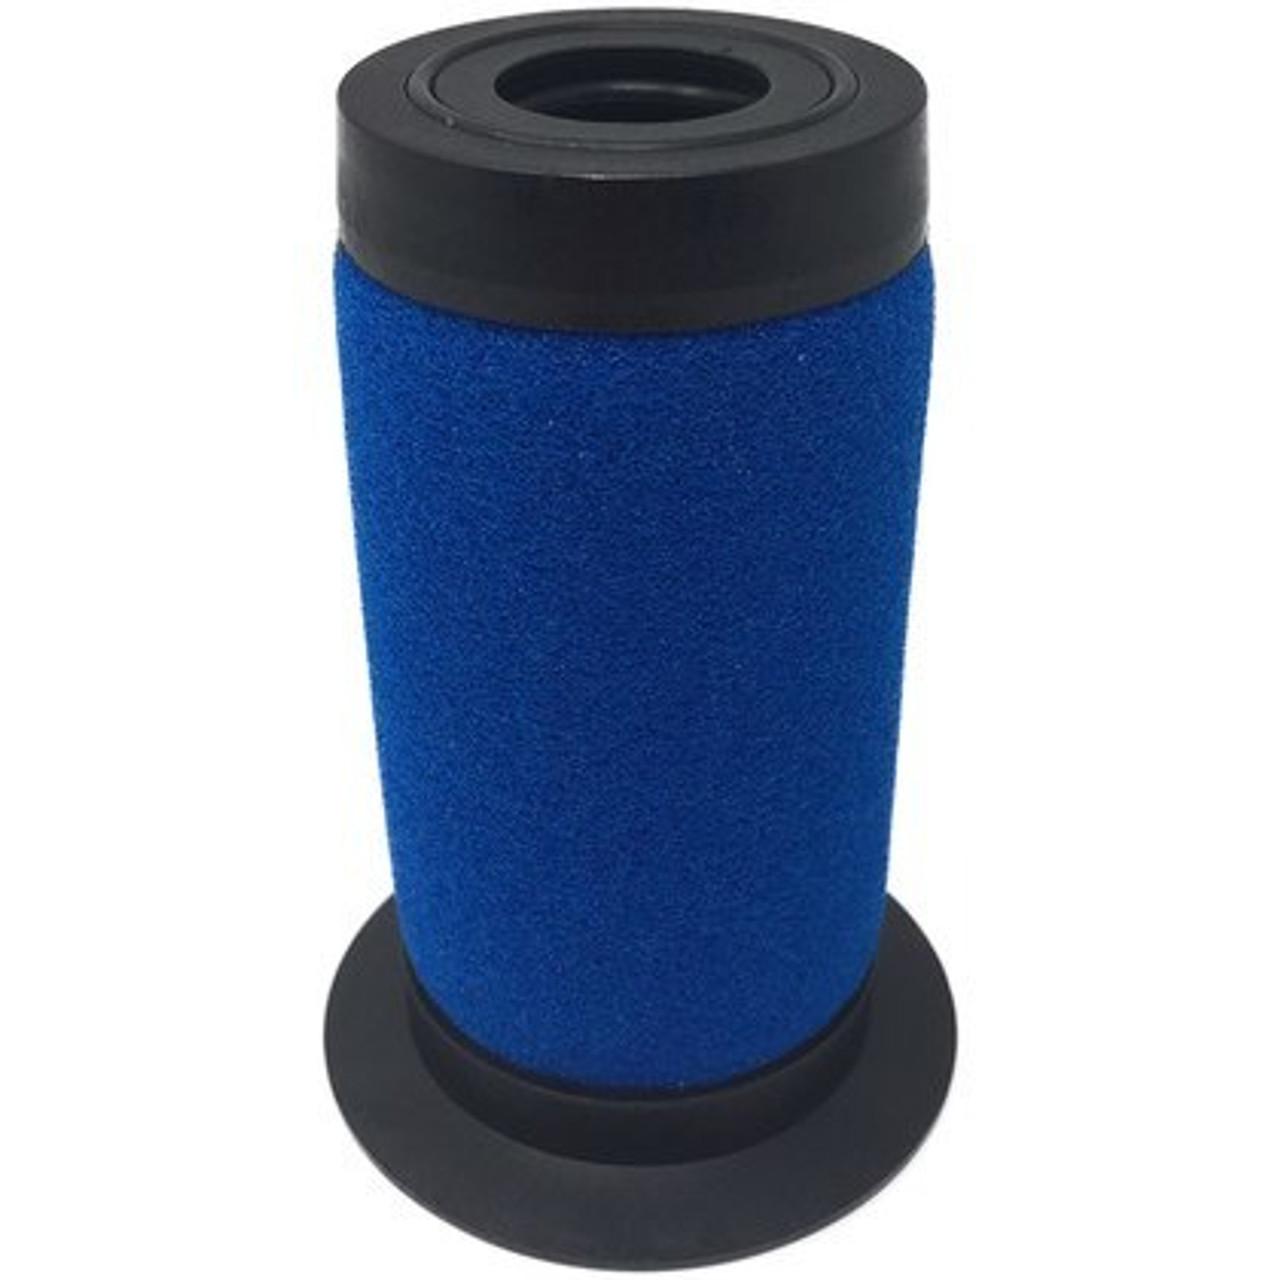 Bright Bore .4000 Max Carbide Boring Bar .1400 Min Depth 2.5000 OAL RedLine Tools - RBB101180R Finish .1875 Shank Dia Uncoated